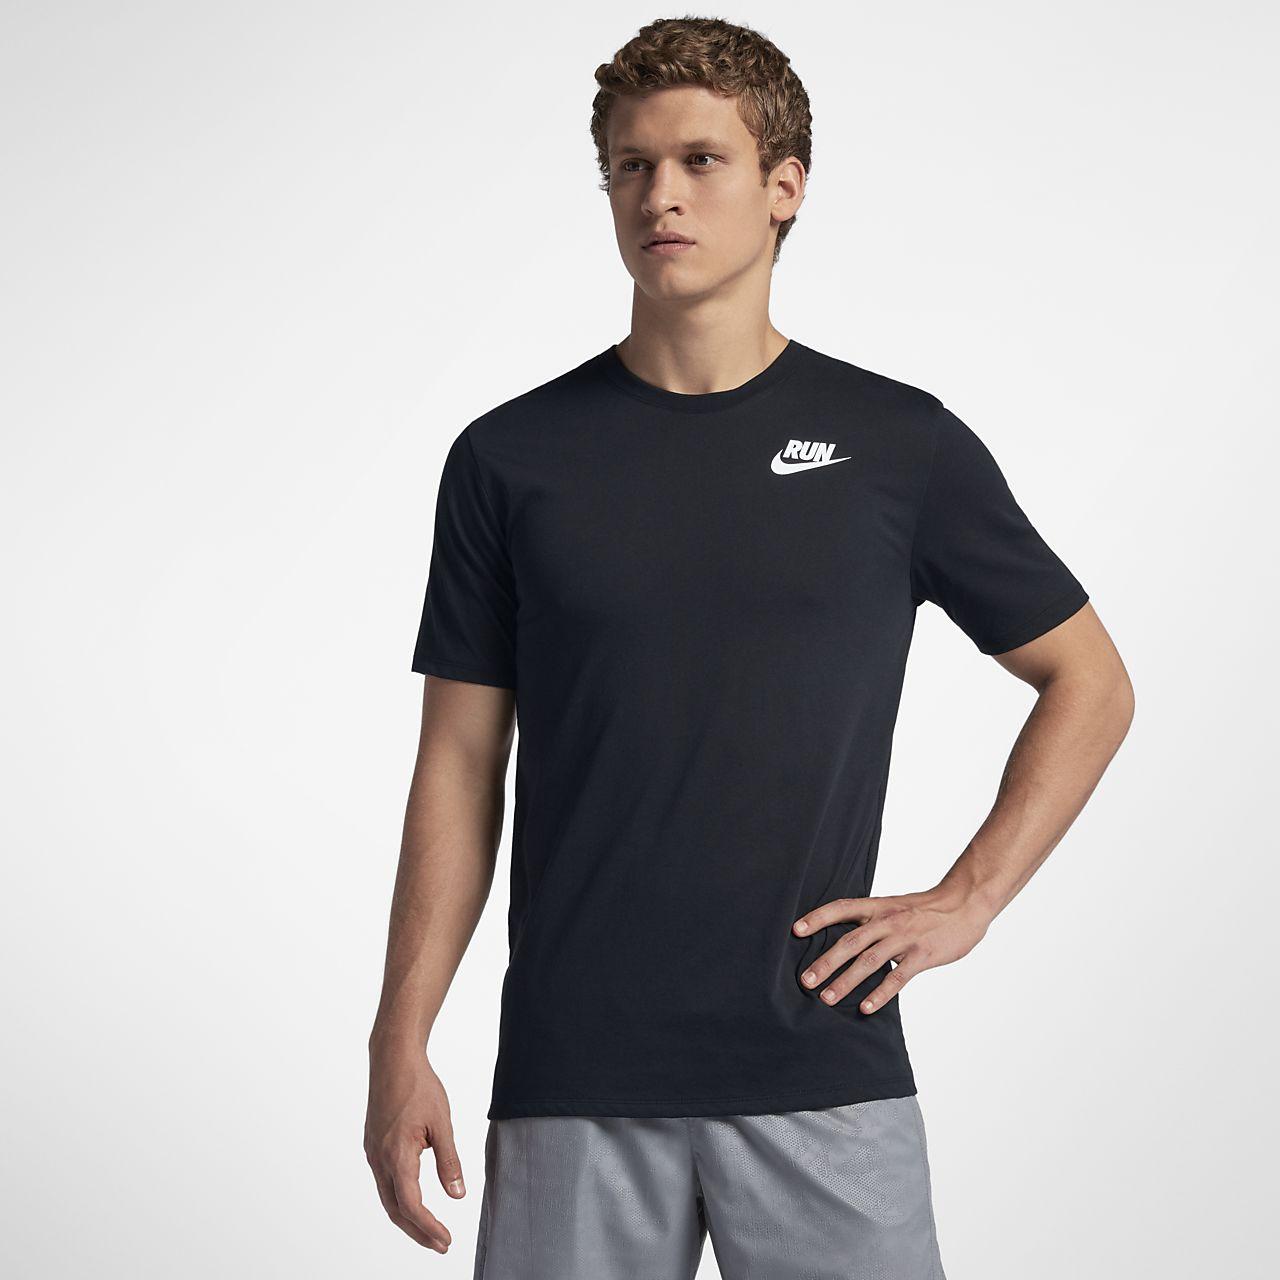 ... Nike Dri-FIT Men's Running T-Shirt